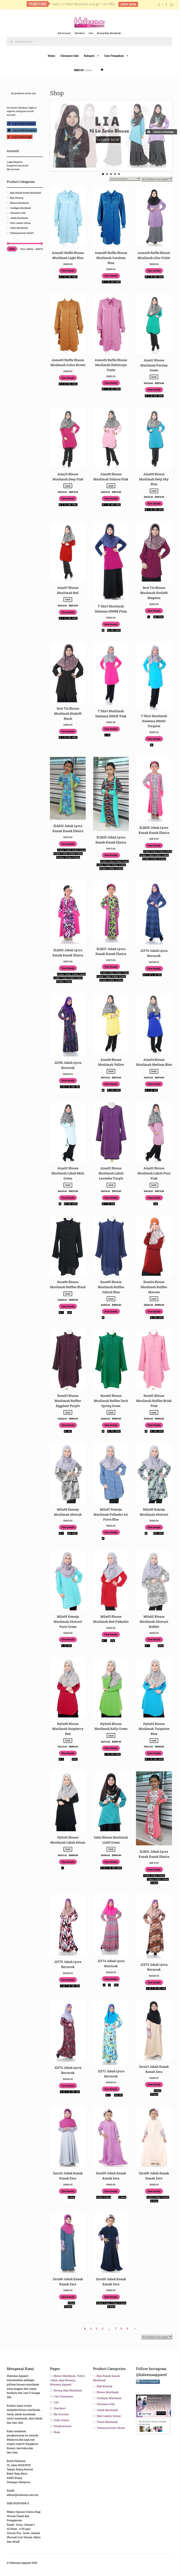 Salamsantuncom Menjual Baju Muslimah Competitors Revenue And 11 12 Tahun Employees Owler Company Profile